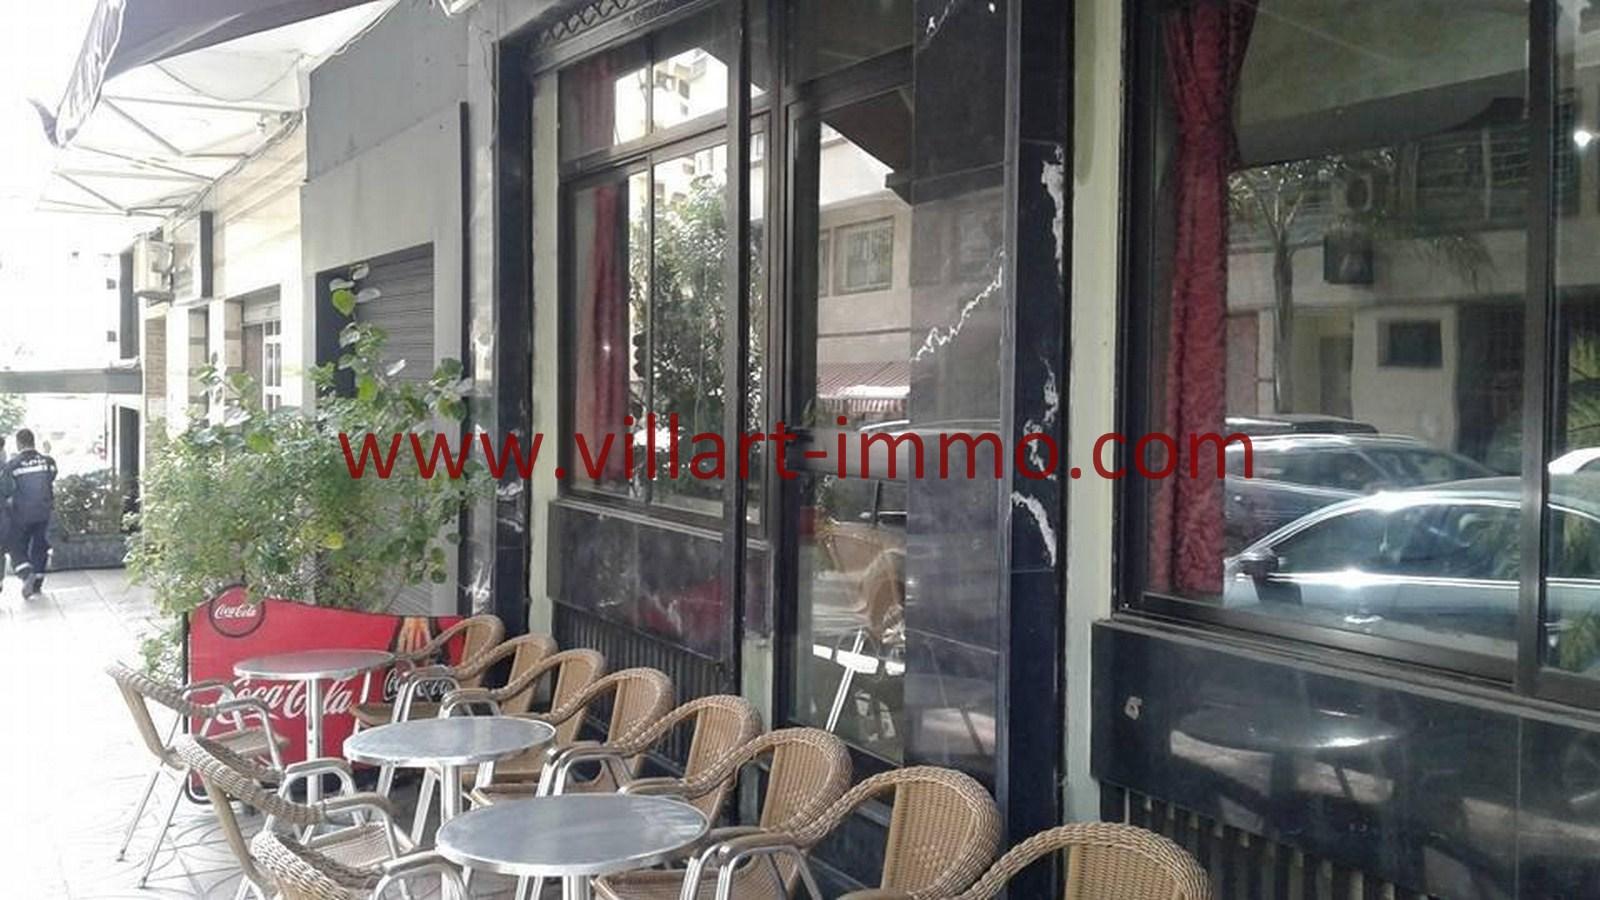 5-Vente-Local-Centre-Ville-Tanger-Exterieur-Villart Immo